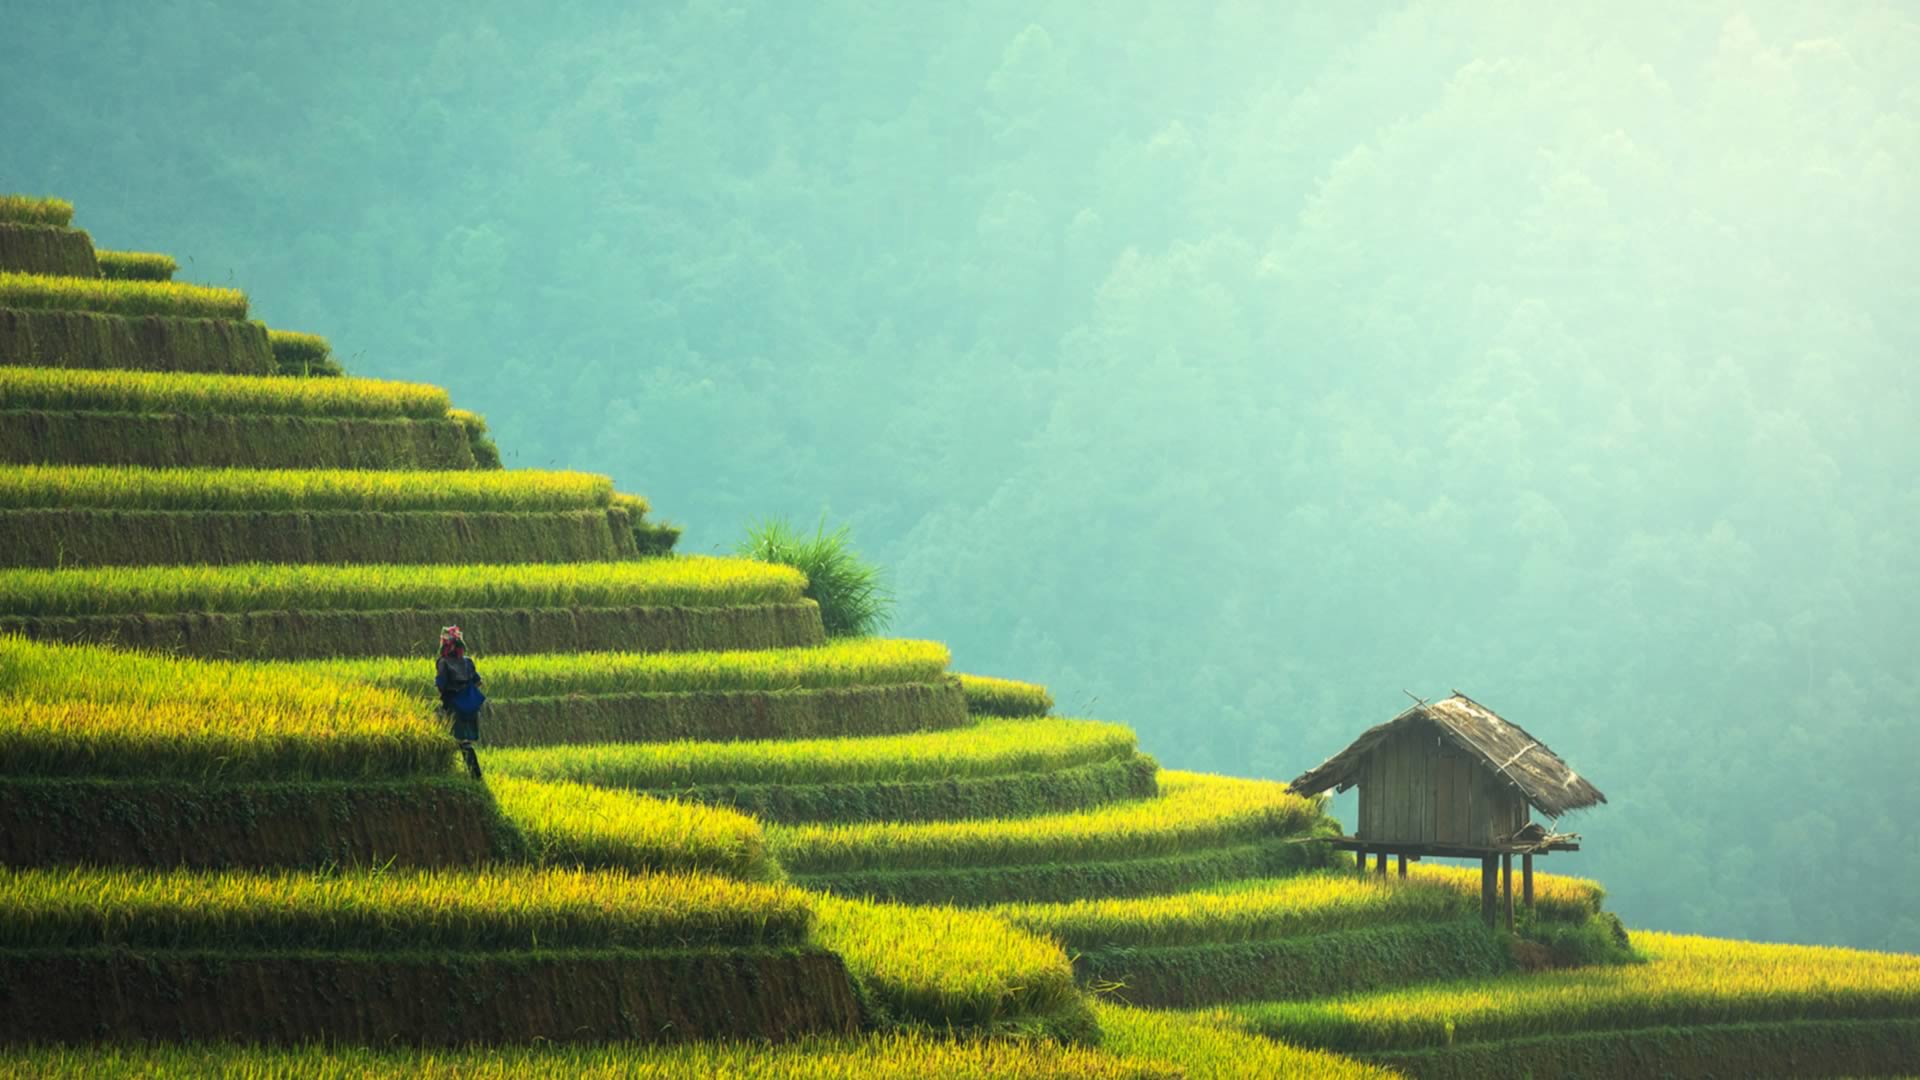 Chine paysage